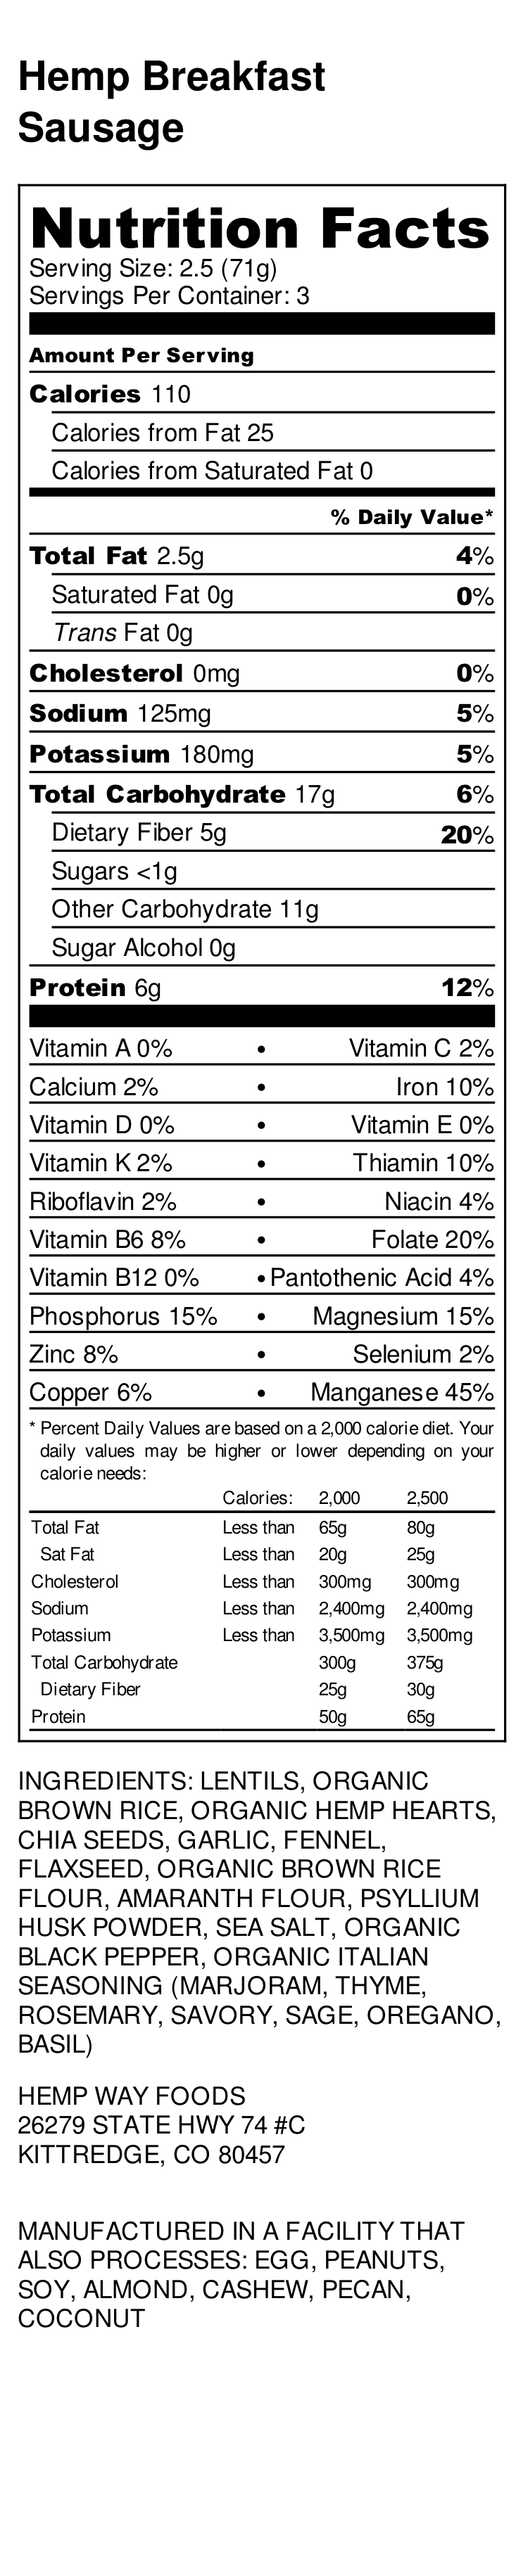 Hemp Breakfast Sausage - Nutrition Label.png